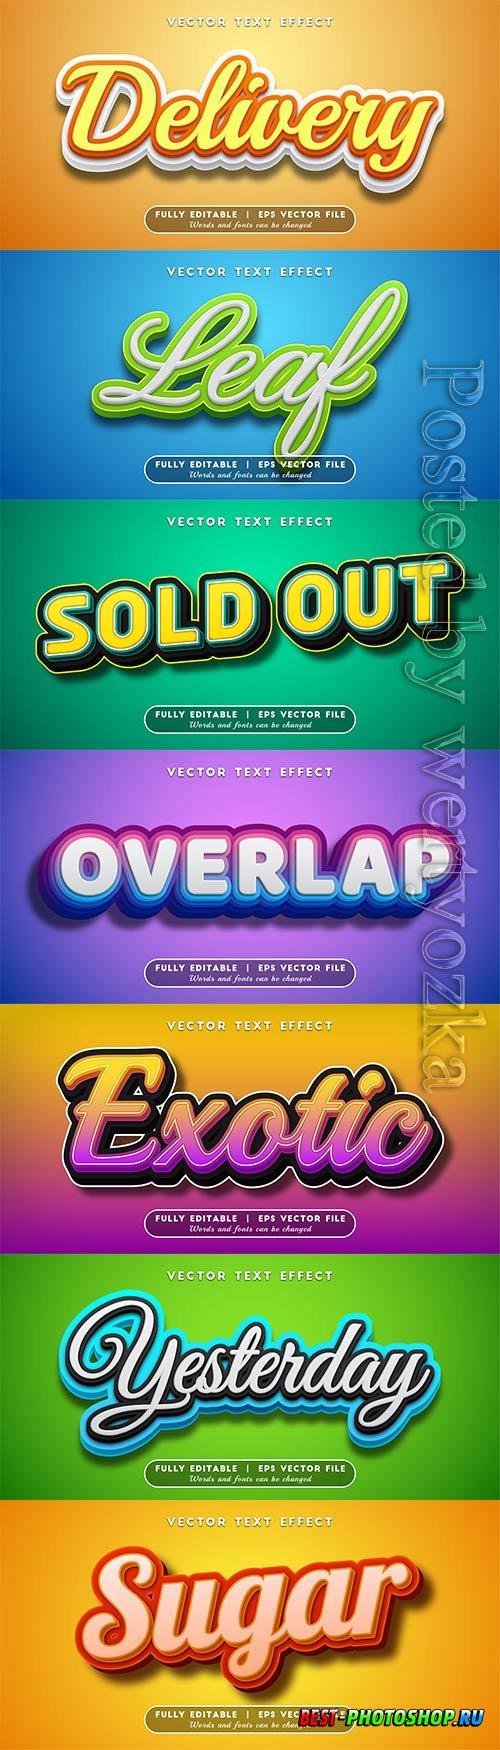 3d editable text style effect vector vol 517